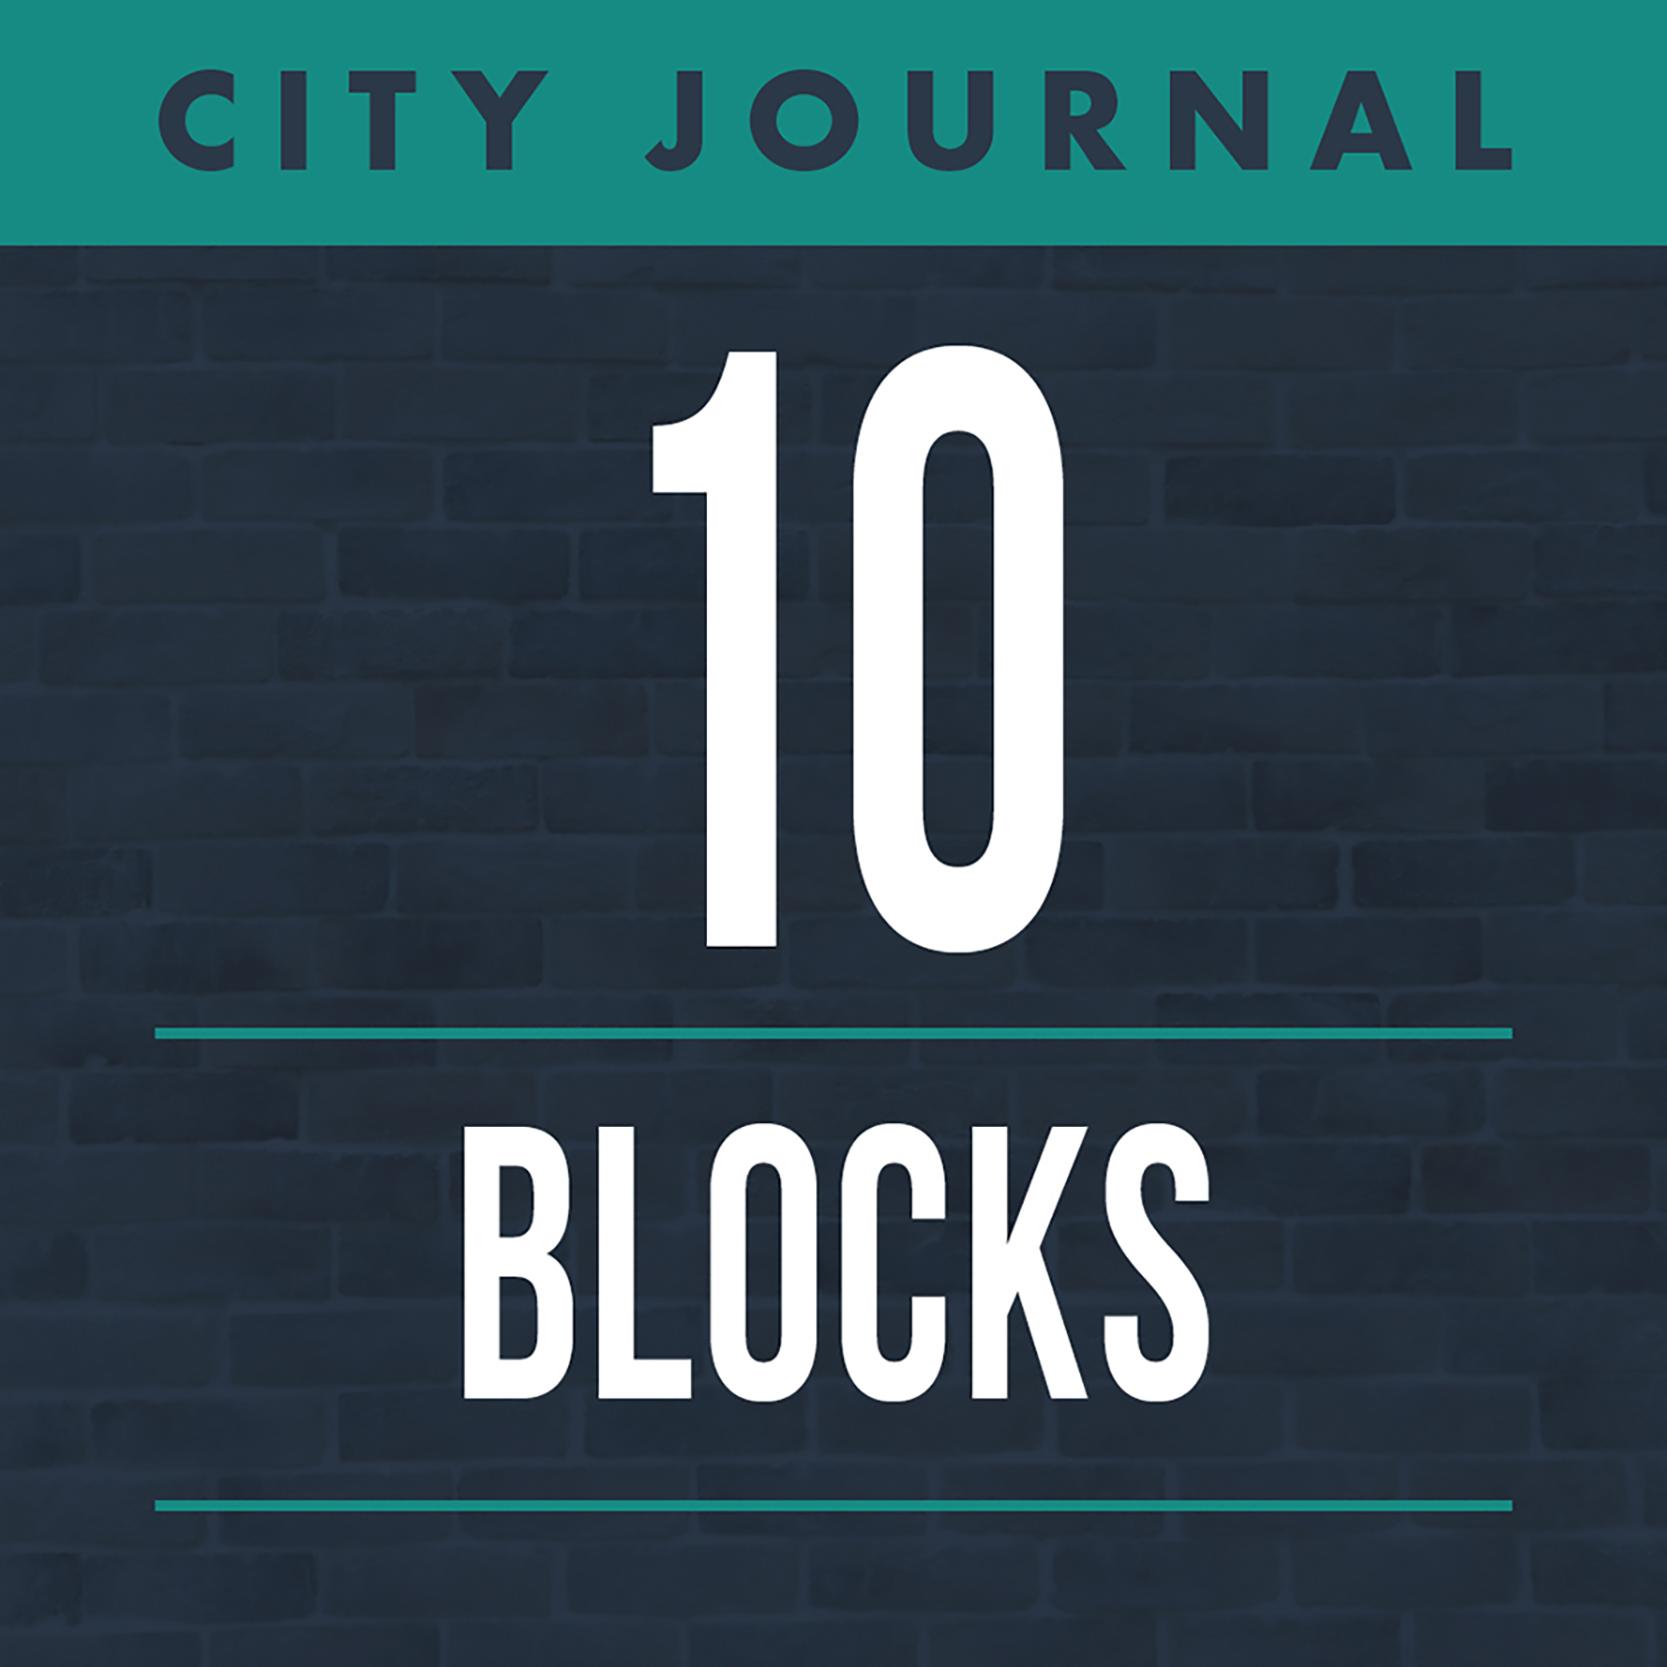 City Journal's 10 Blocks show art